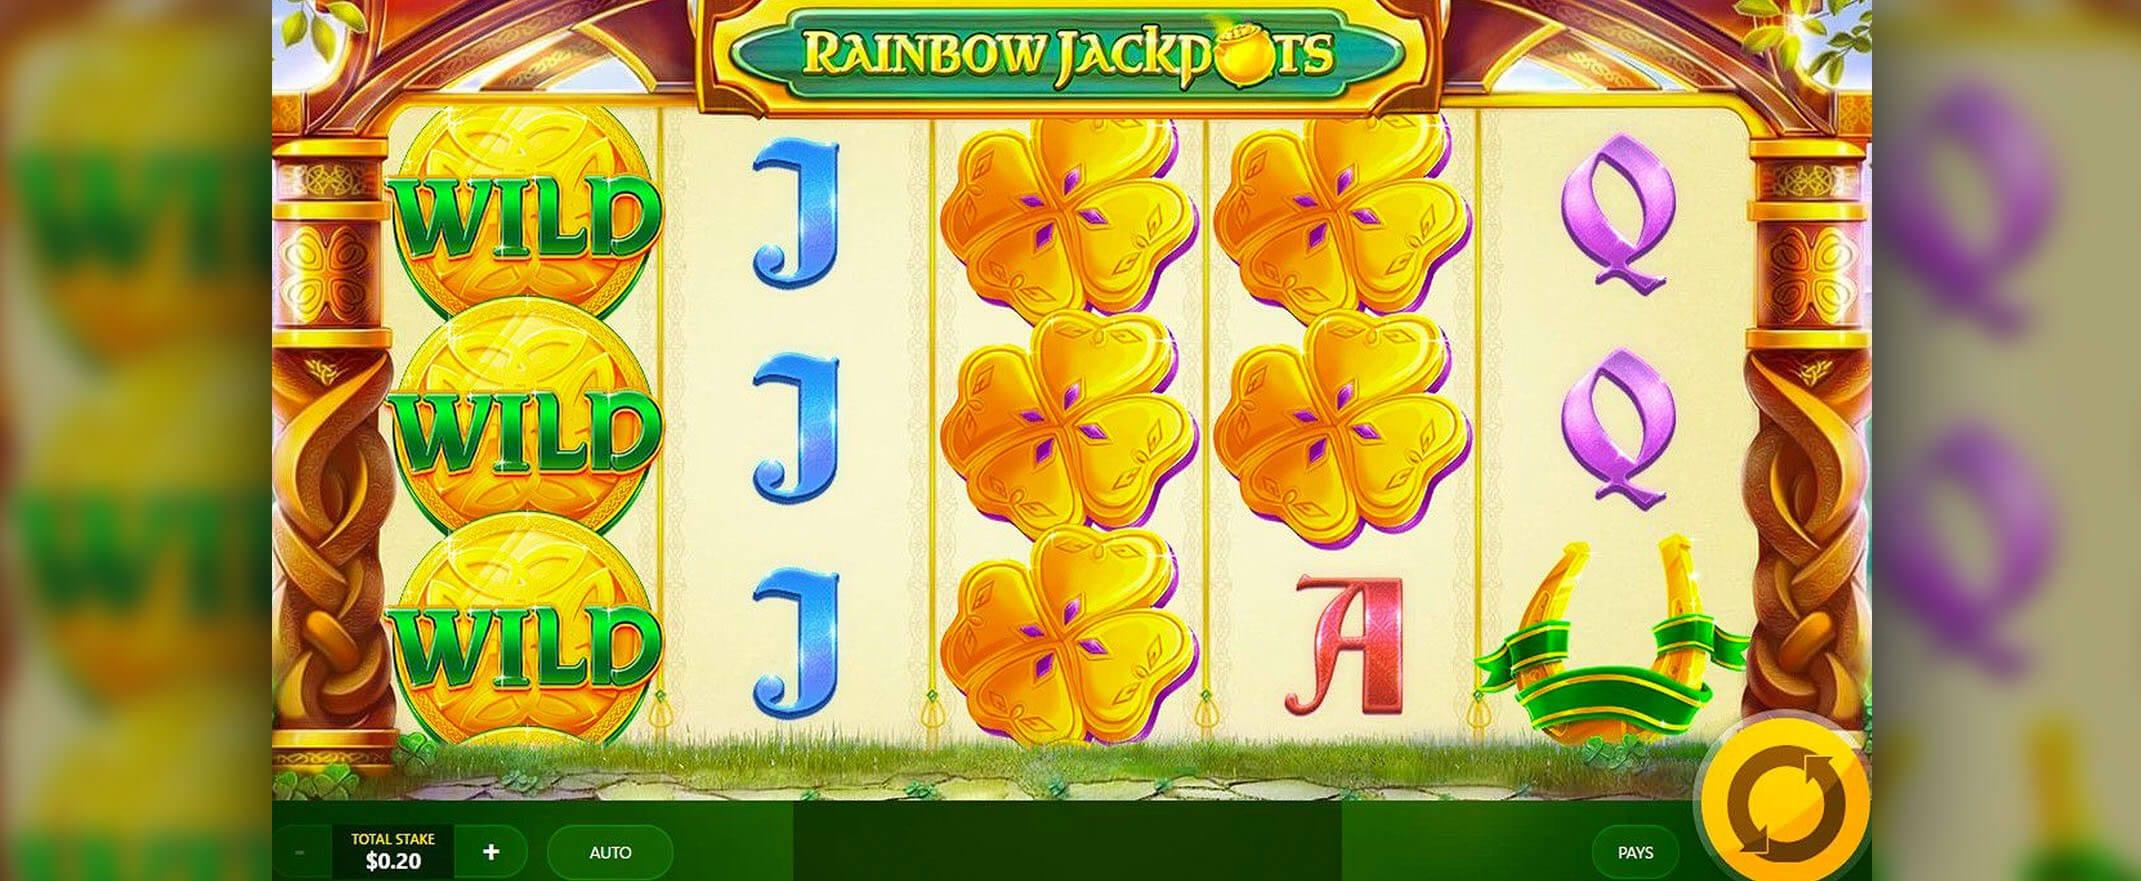 Rainbow Jackpots Slots UK